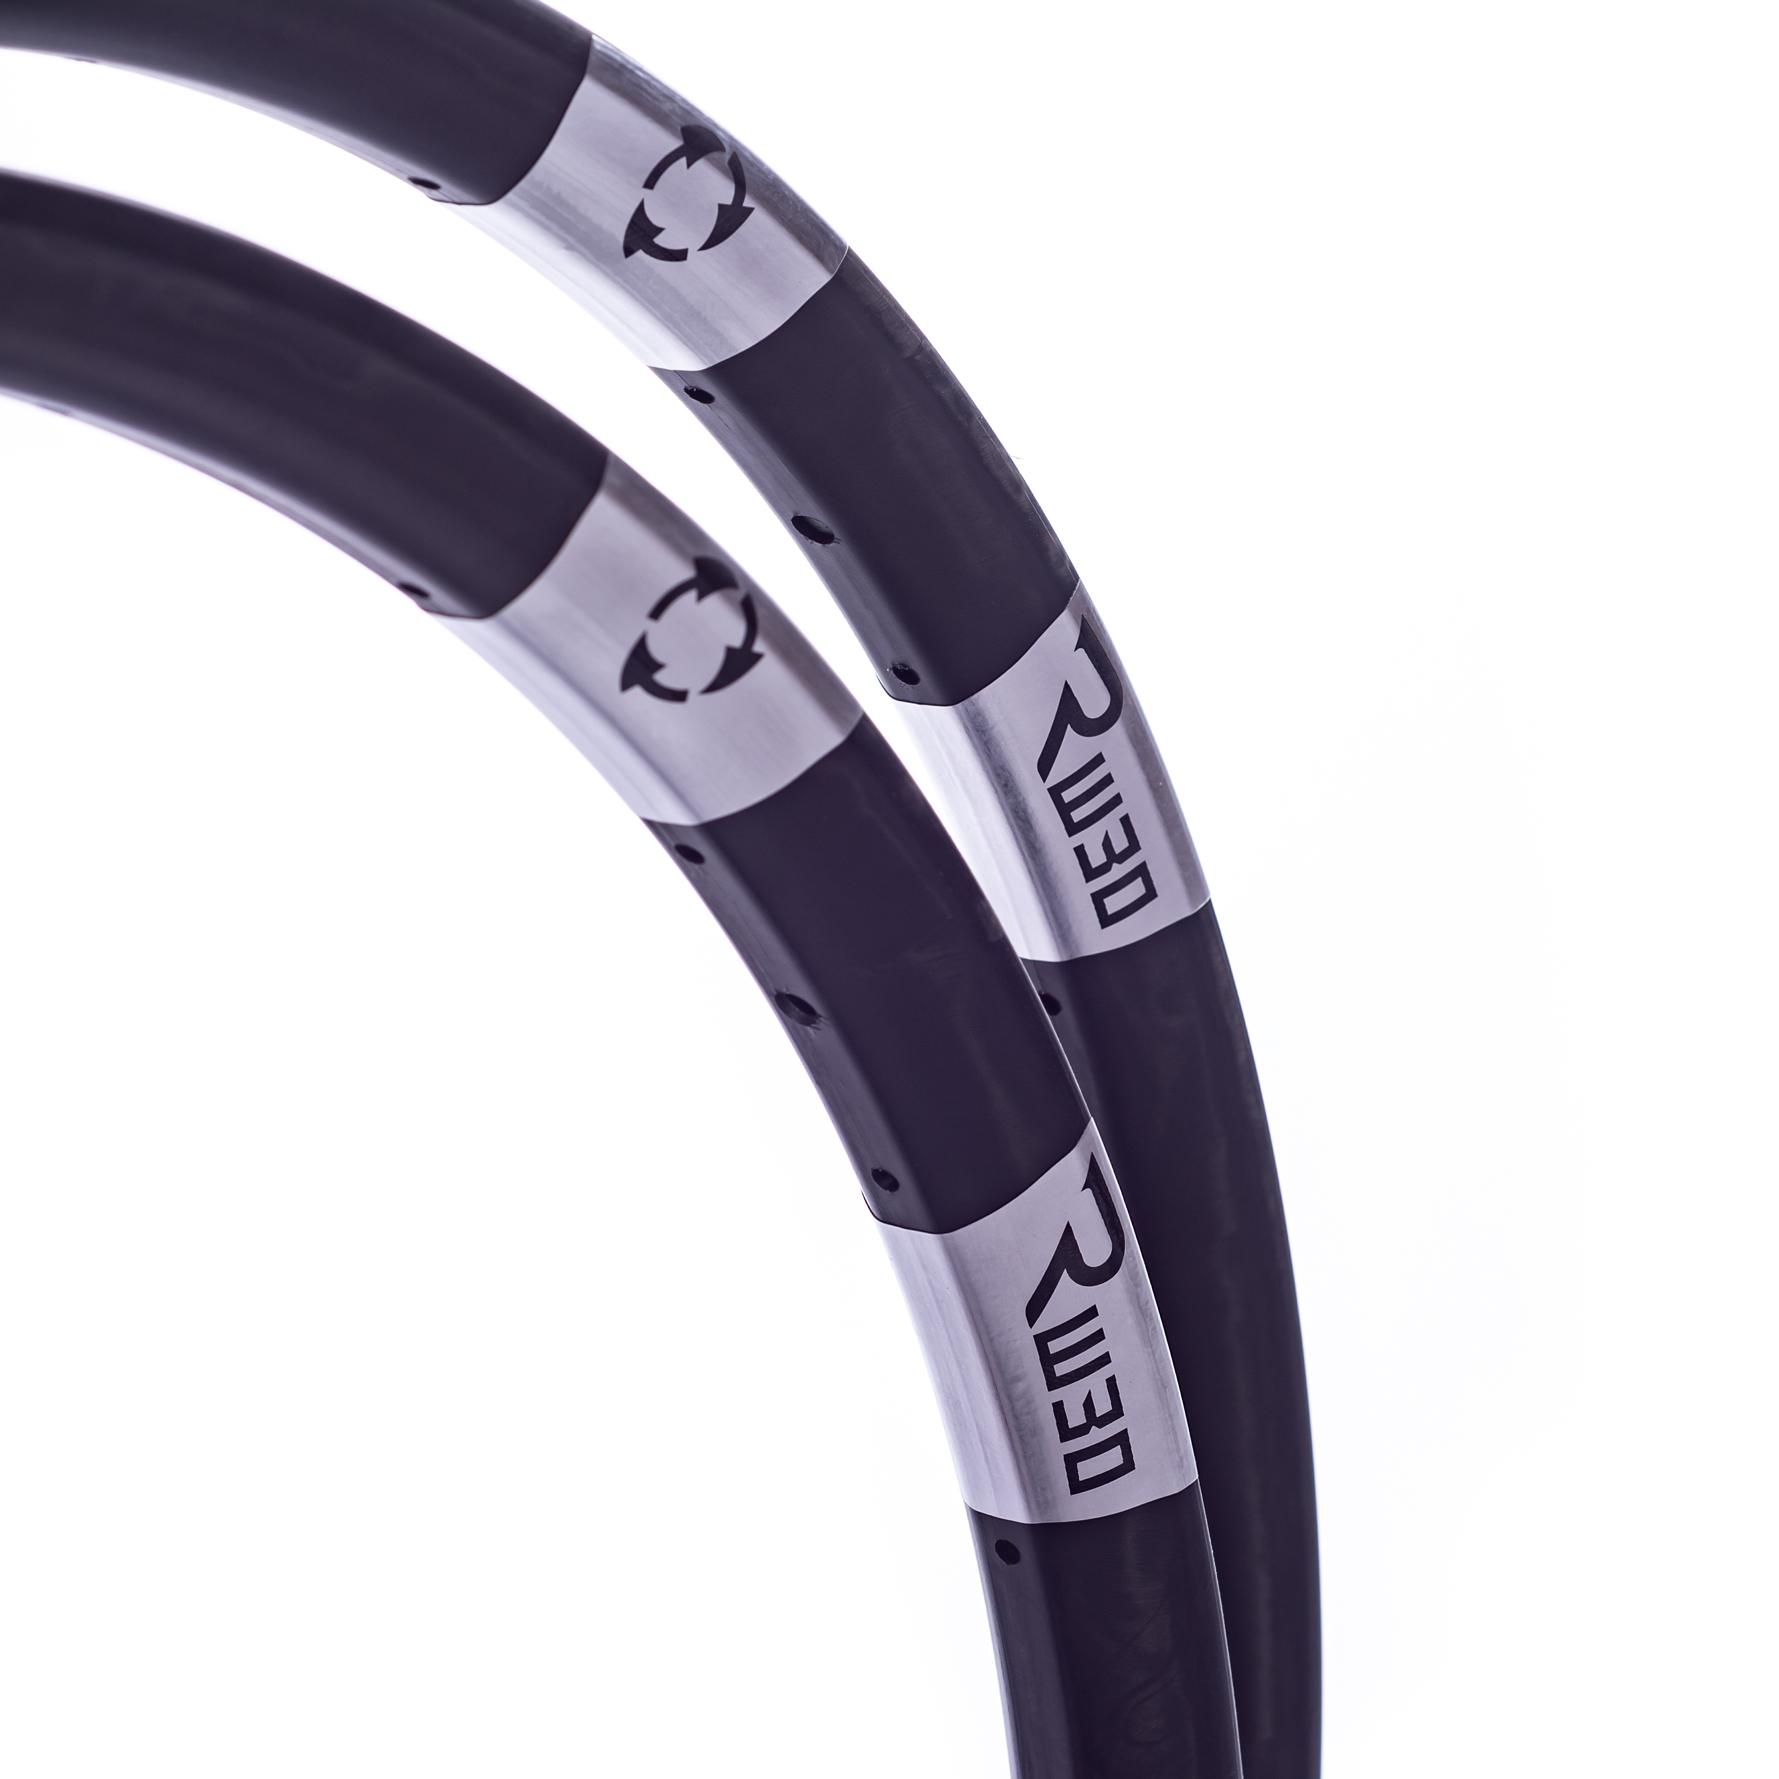 Revel Wheels RW30 Fusion Fiber carbon rims